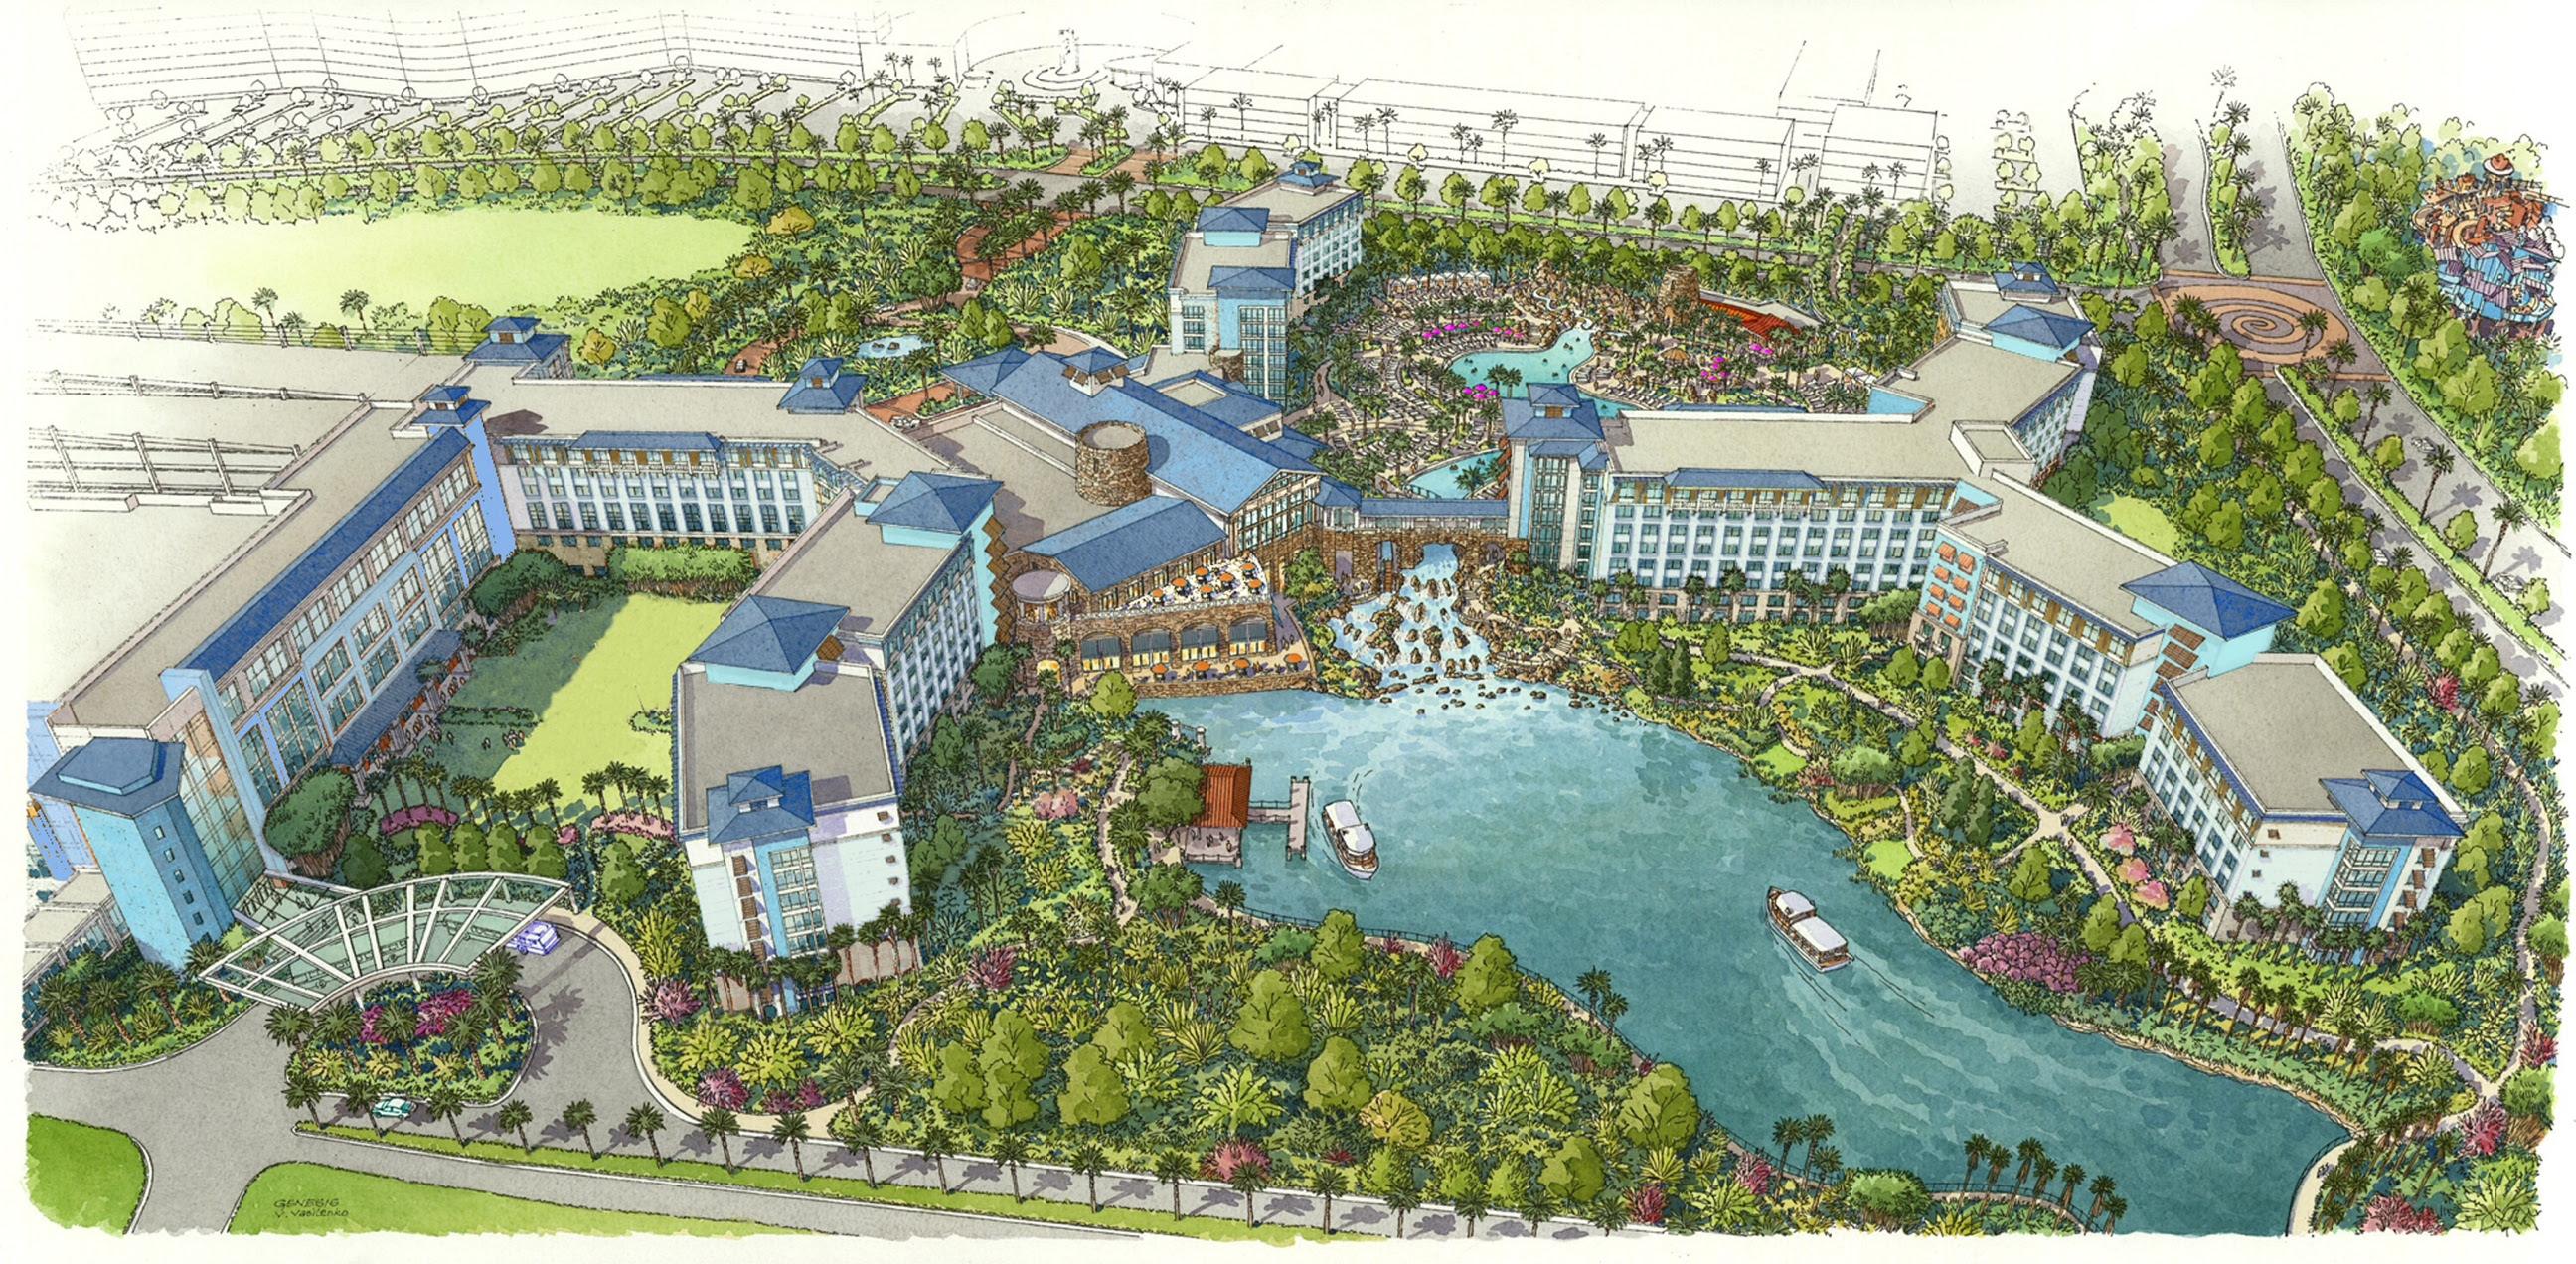 Universal Orlando Sapphire Falls Resort Opening in 2016